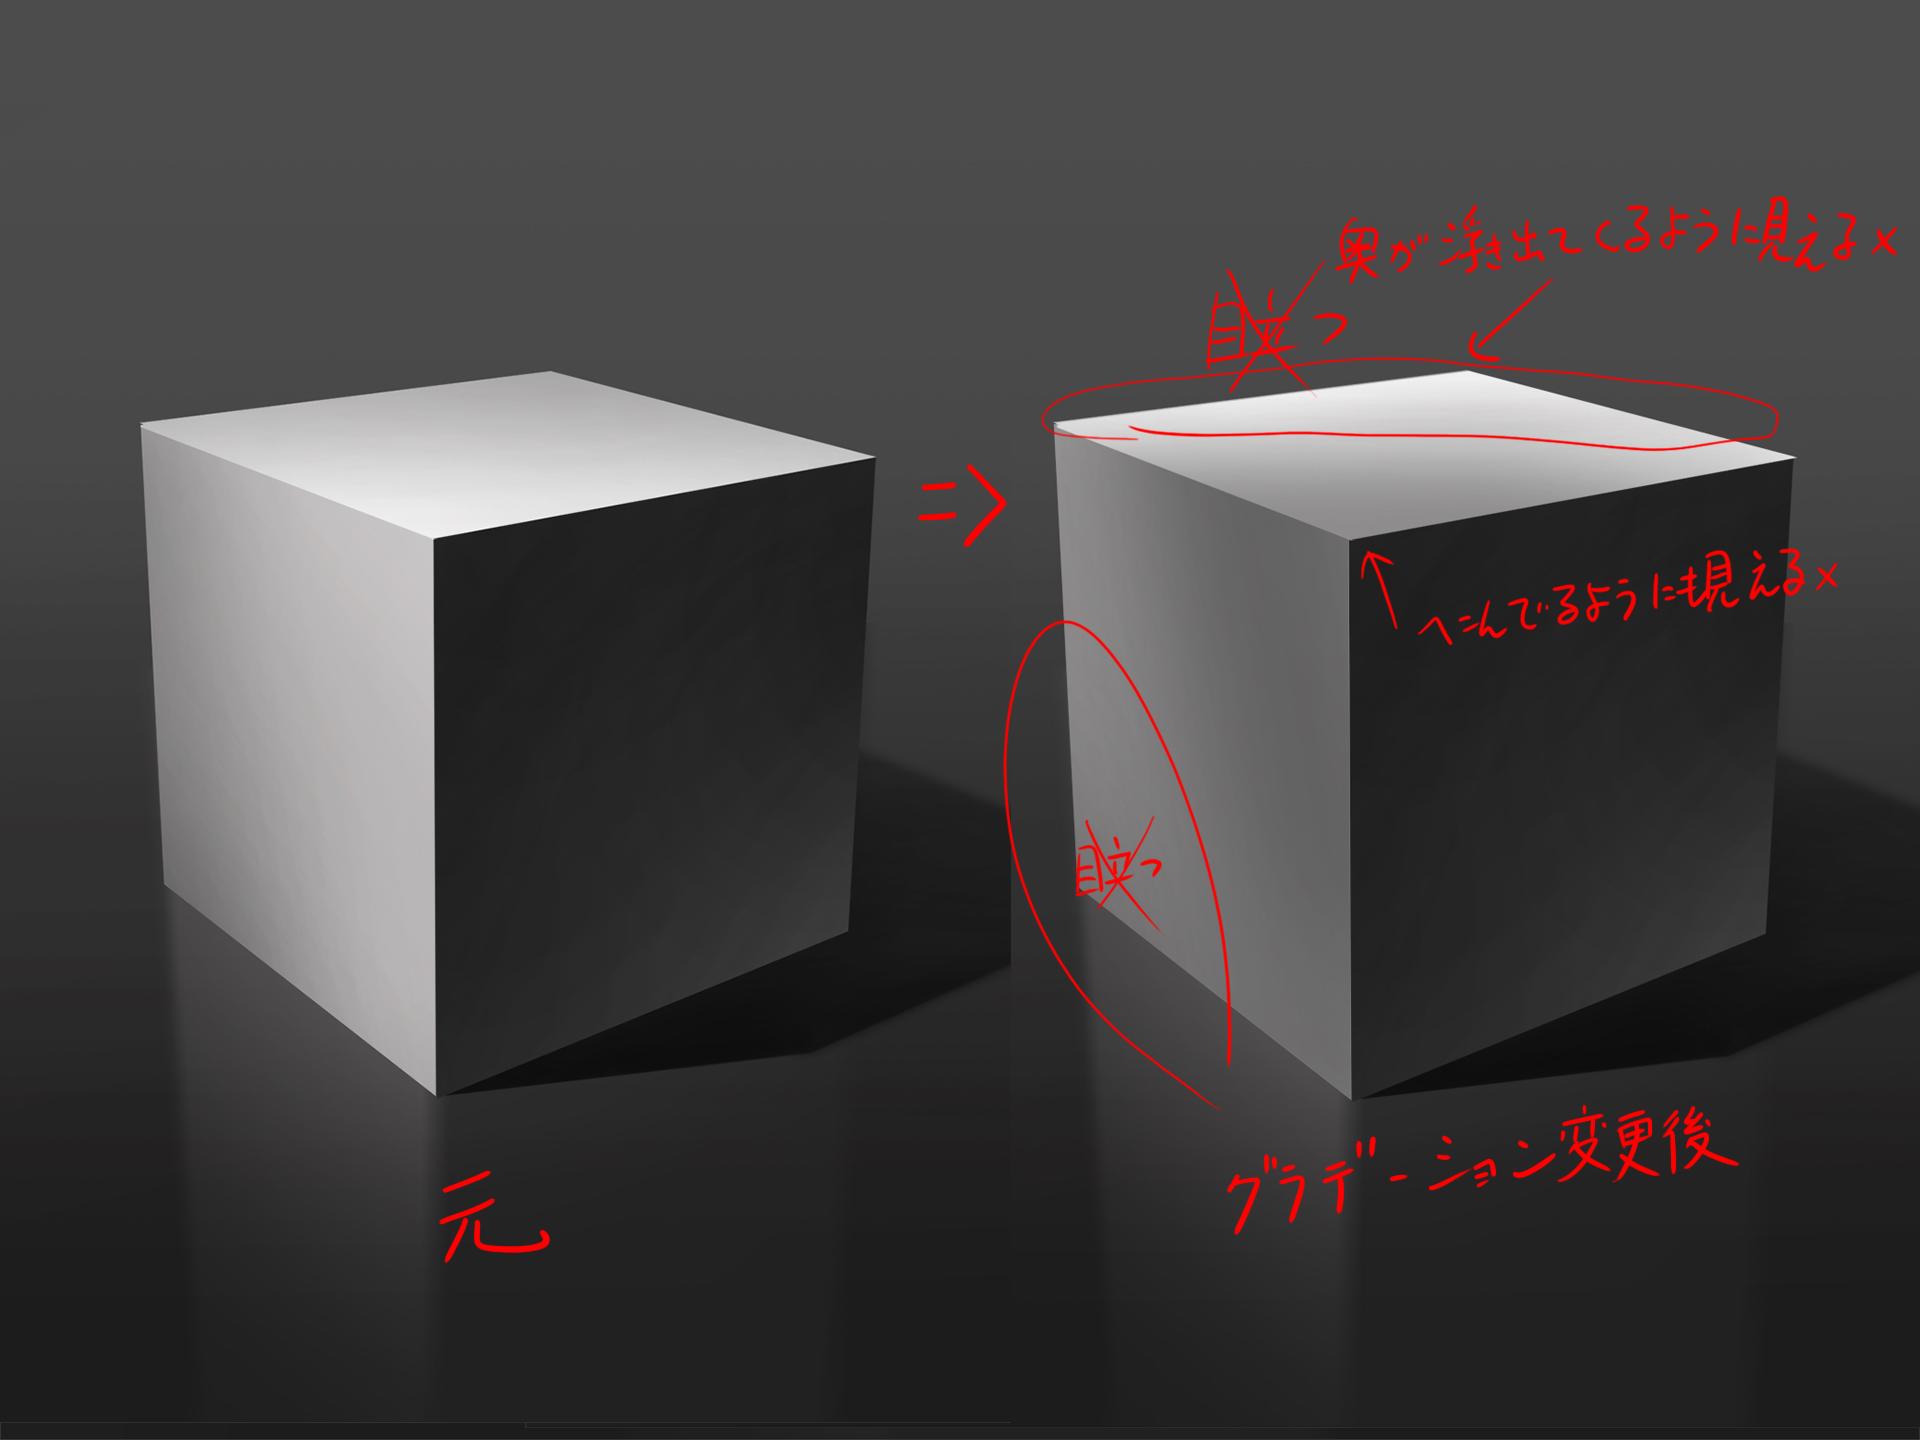 立方体 完成 違い